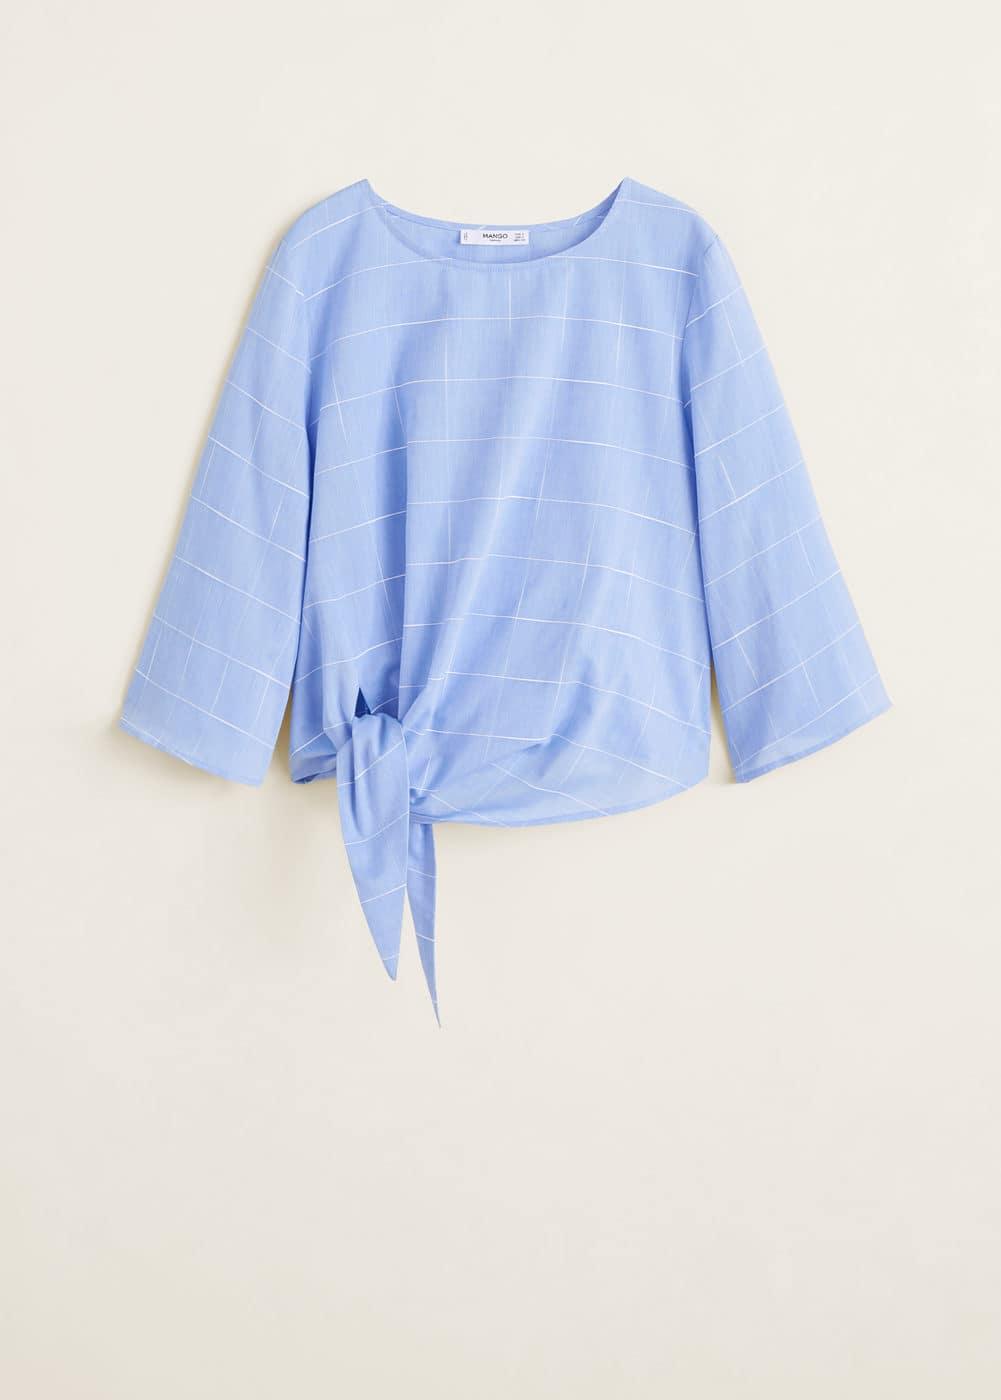 Mango - Blusa nudo algodón - 5